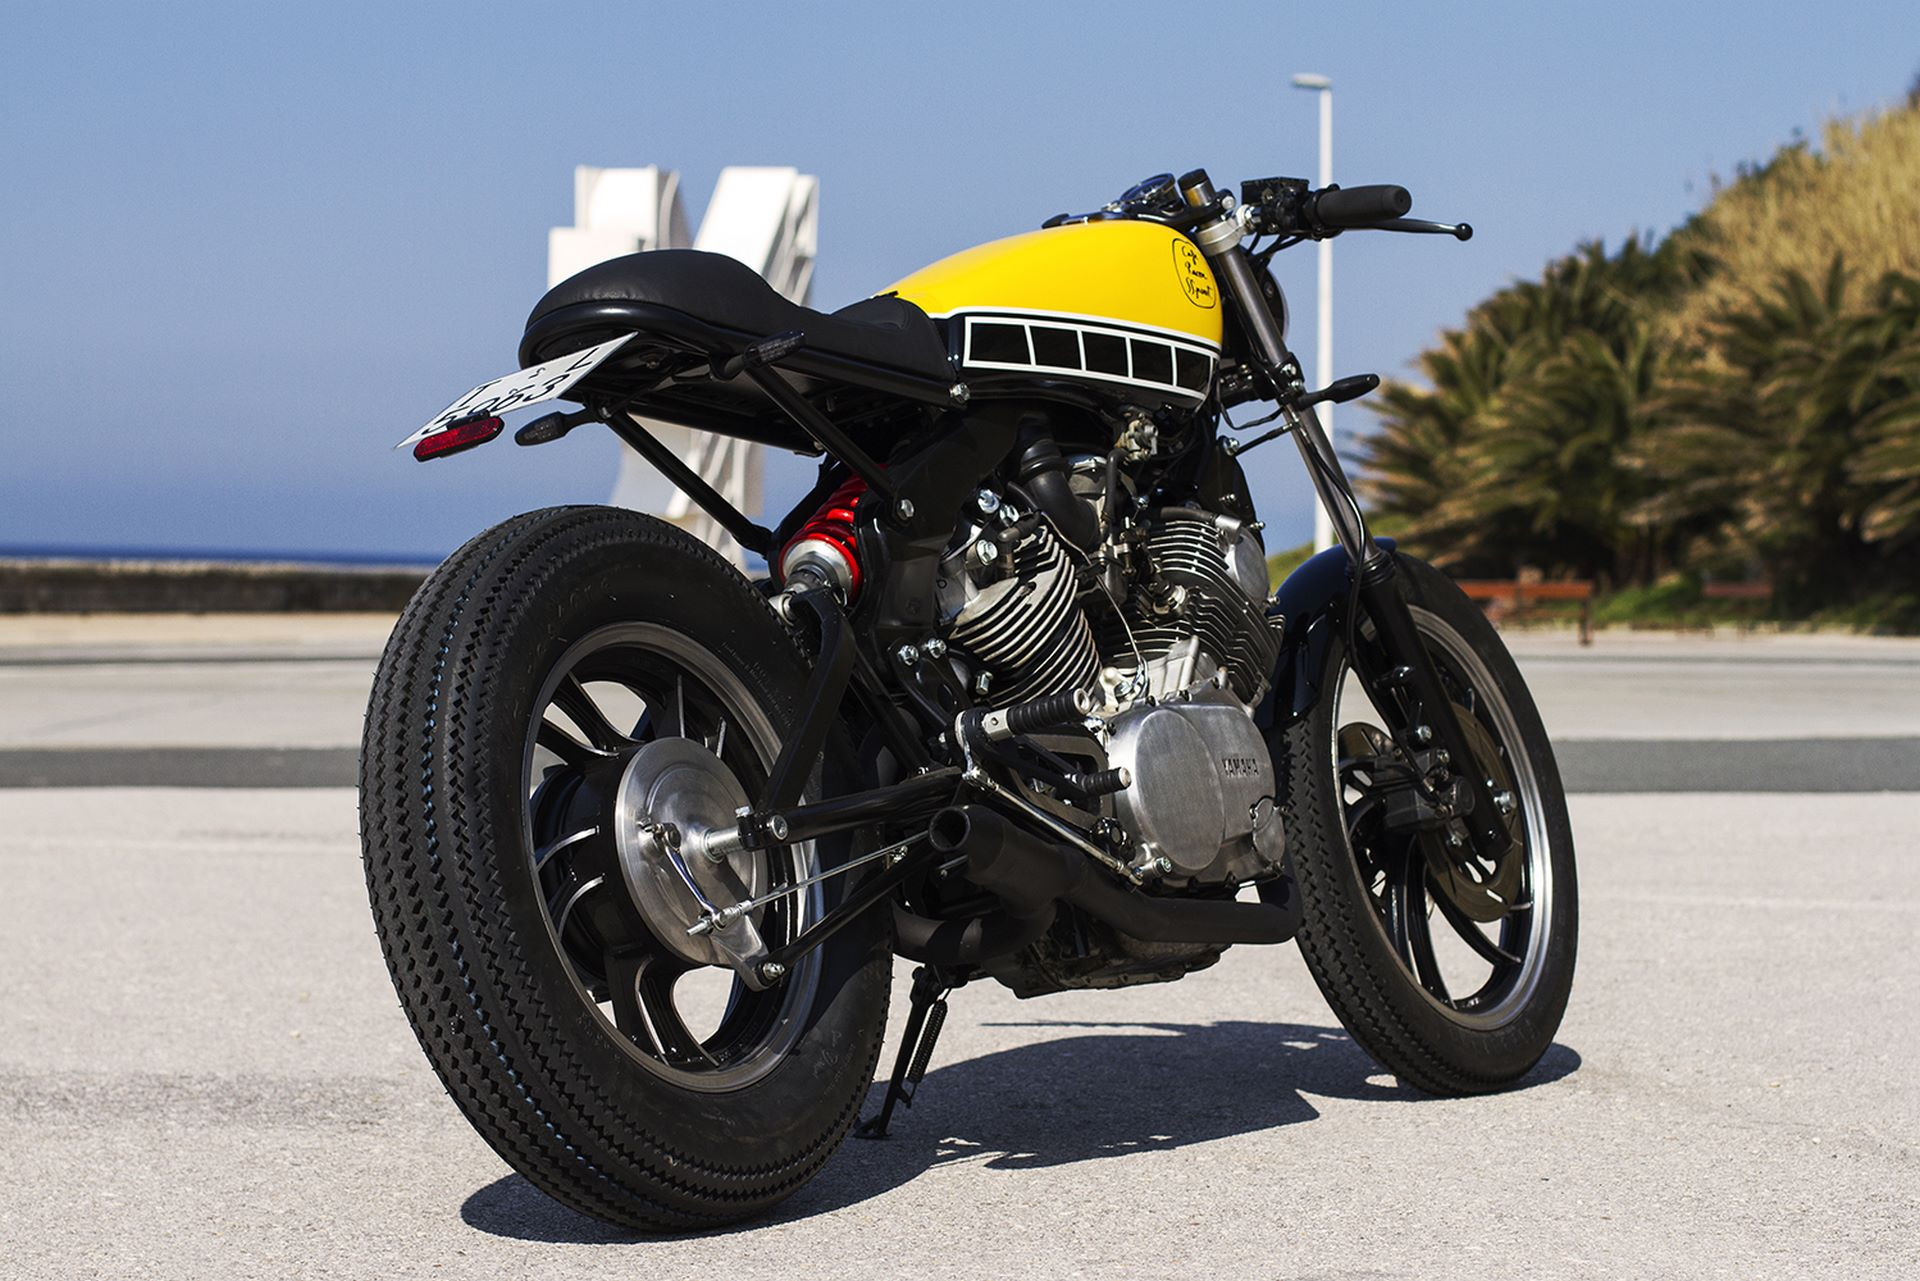 Yamaha Xv Cafe Racer